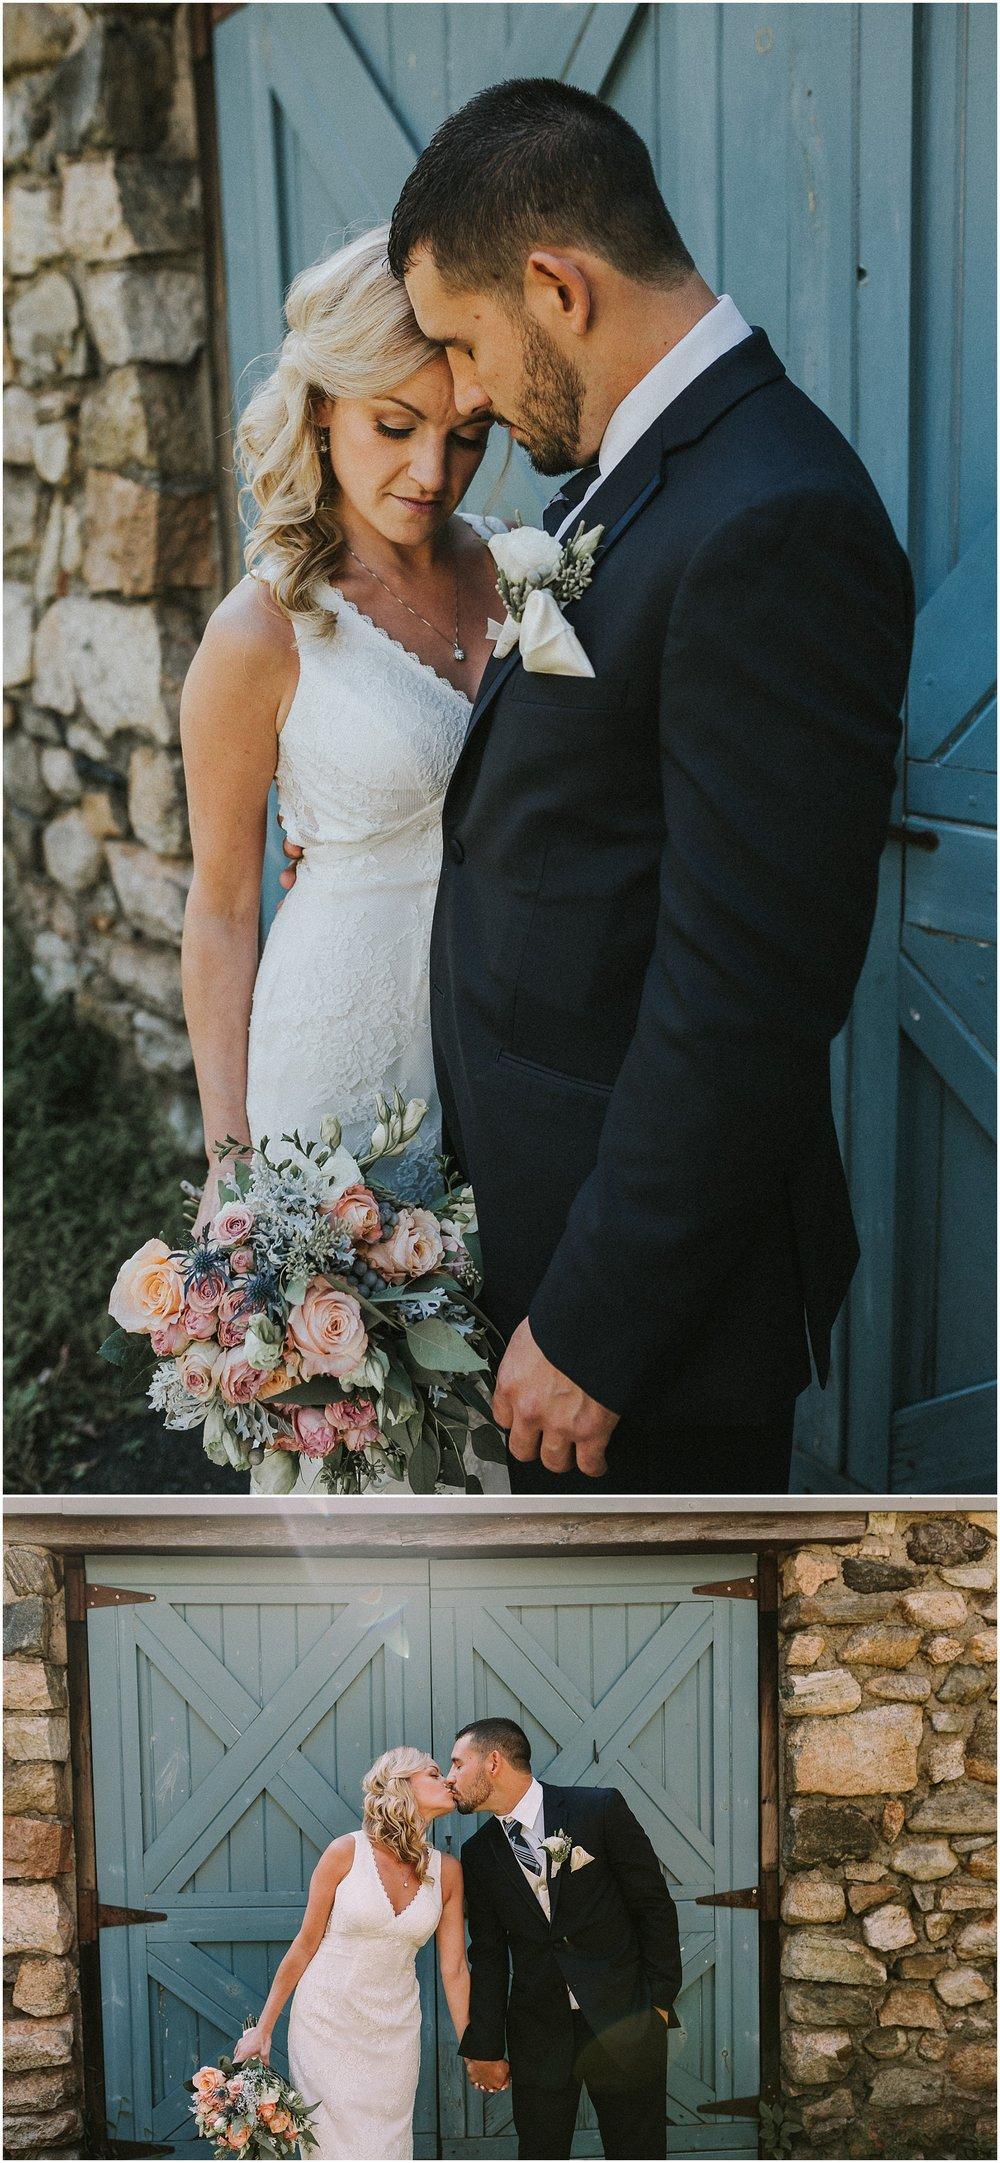 waterloo-village-waterloo village-wedding-outdoor wedding-rustic-boemian-new jersey-bride-groom-wedding party-davids bridal-wedding dress-wedding-first kiss-intimate wedding_0359.jpg